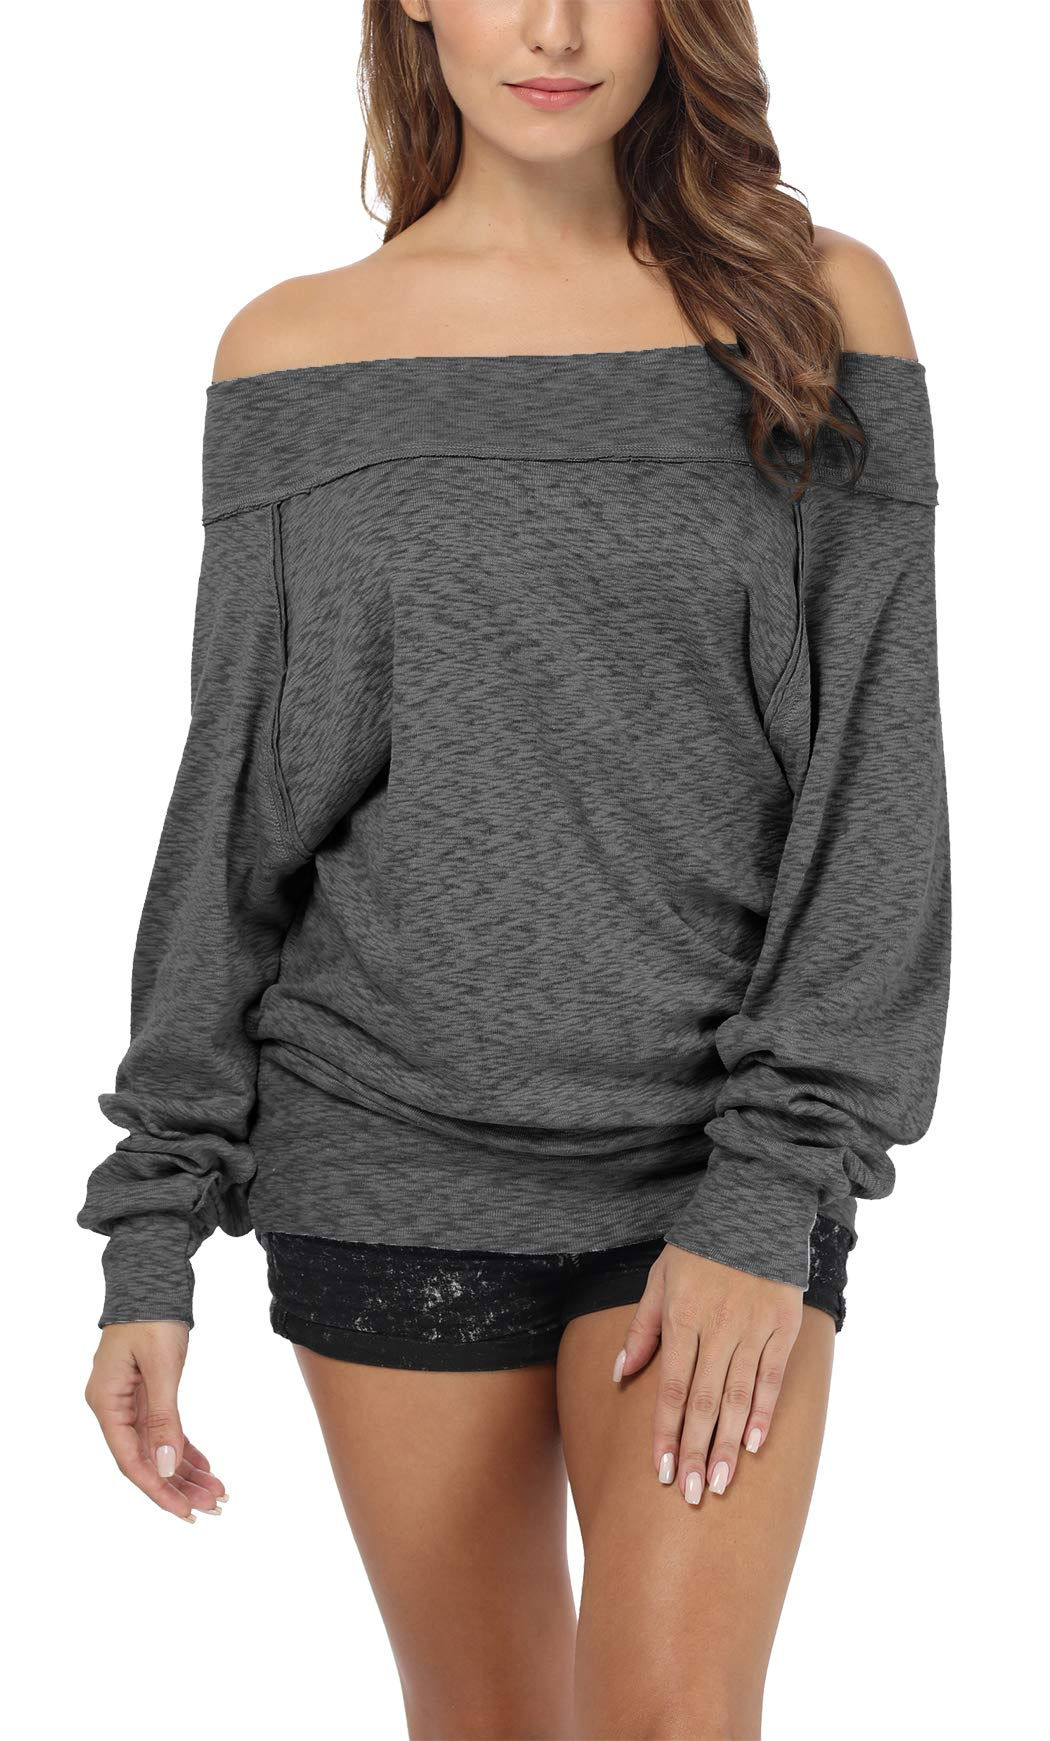 iGENJUN Women's Dolman Sleeve Off The Shoulder Sweater Shirt Tops,Dark Grey,XL